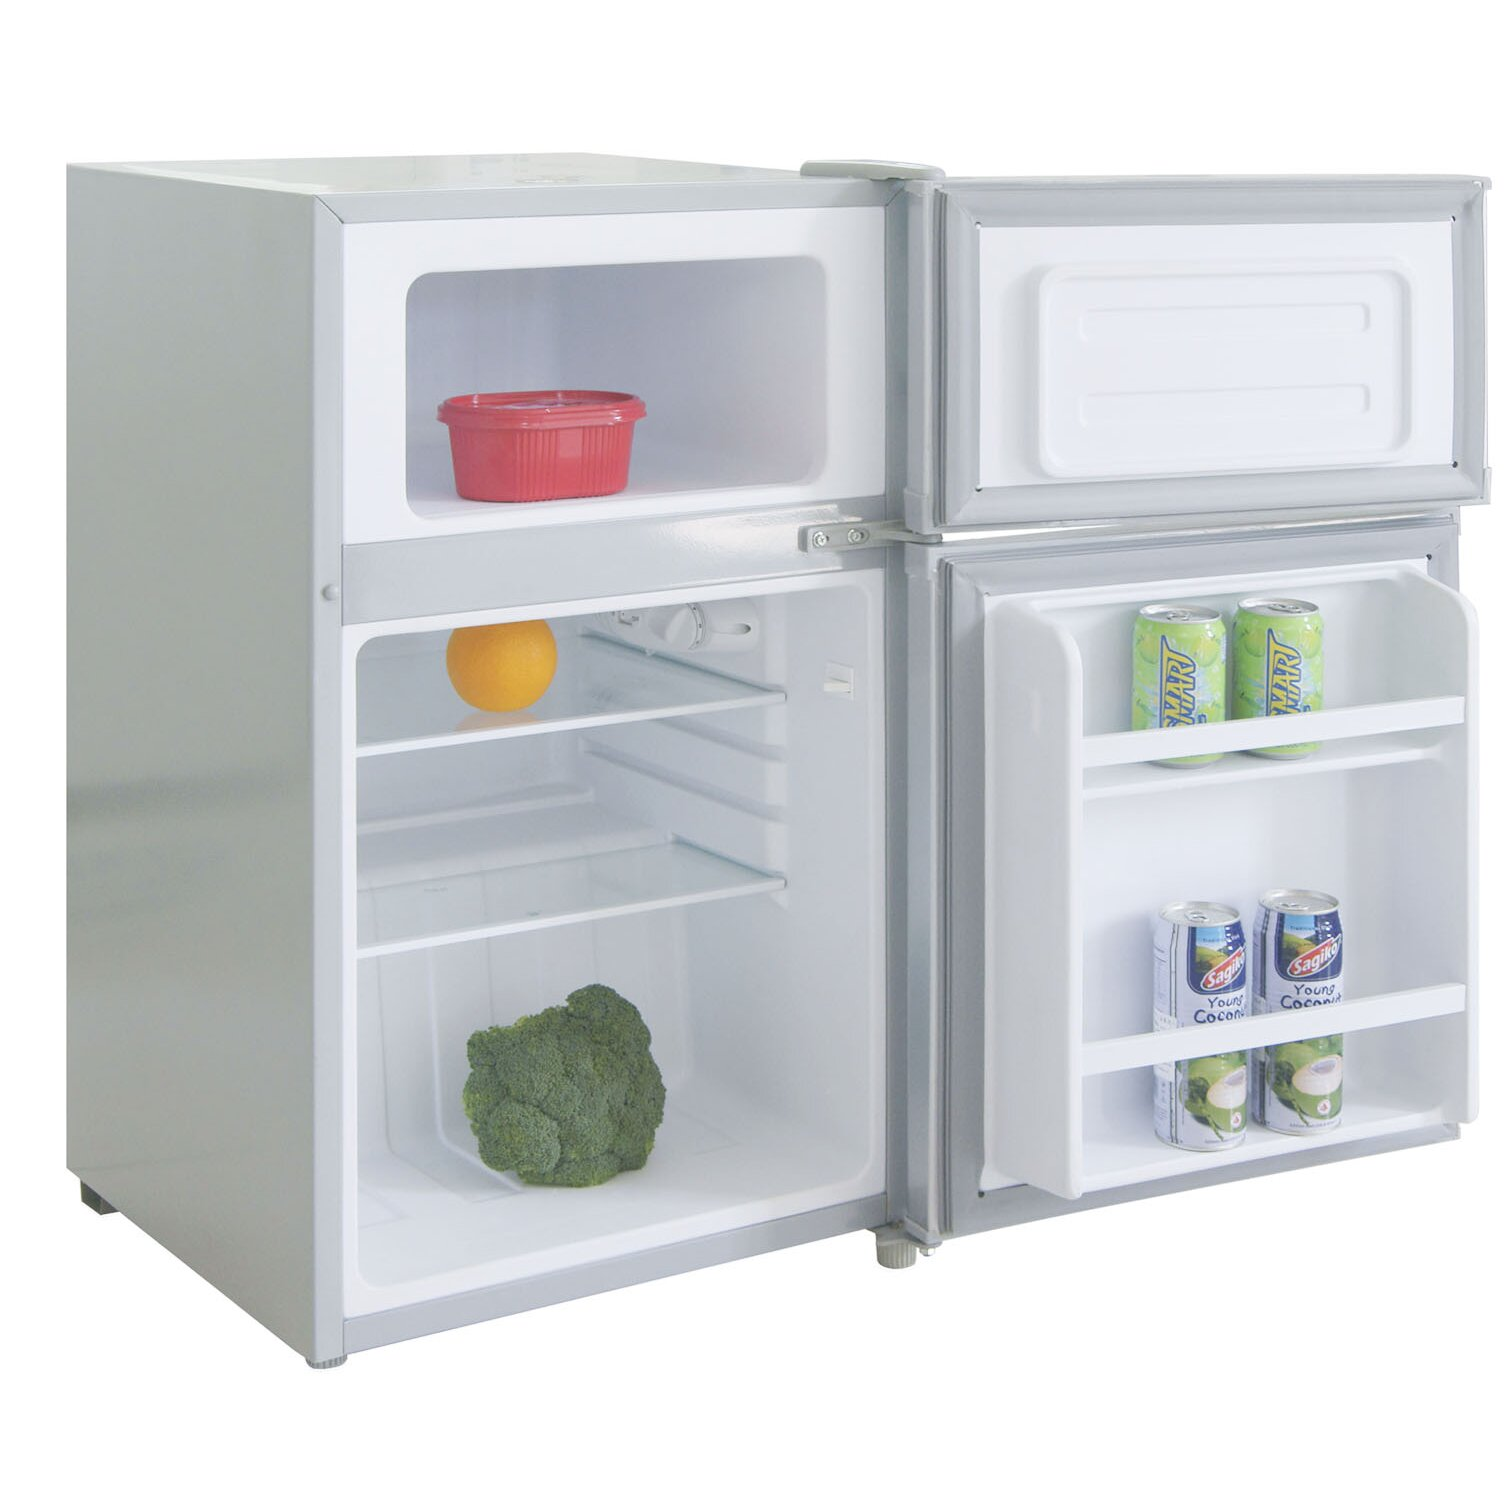 Igloo 3 2 Cu Ft Compact Refrigerator With Freezer